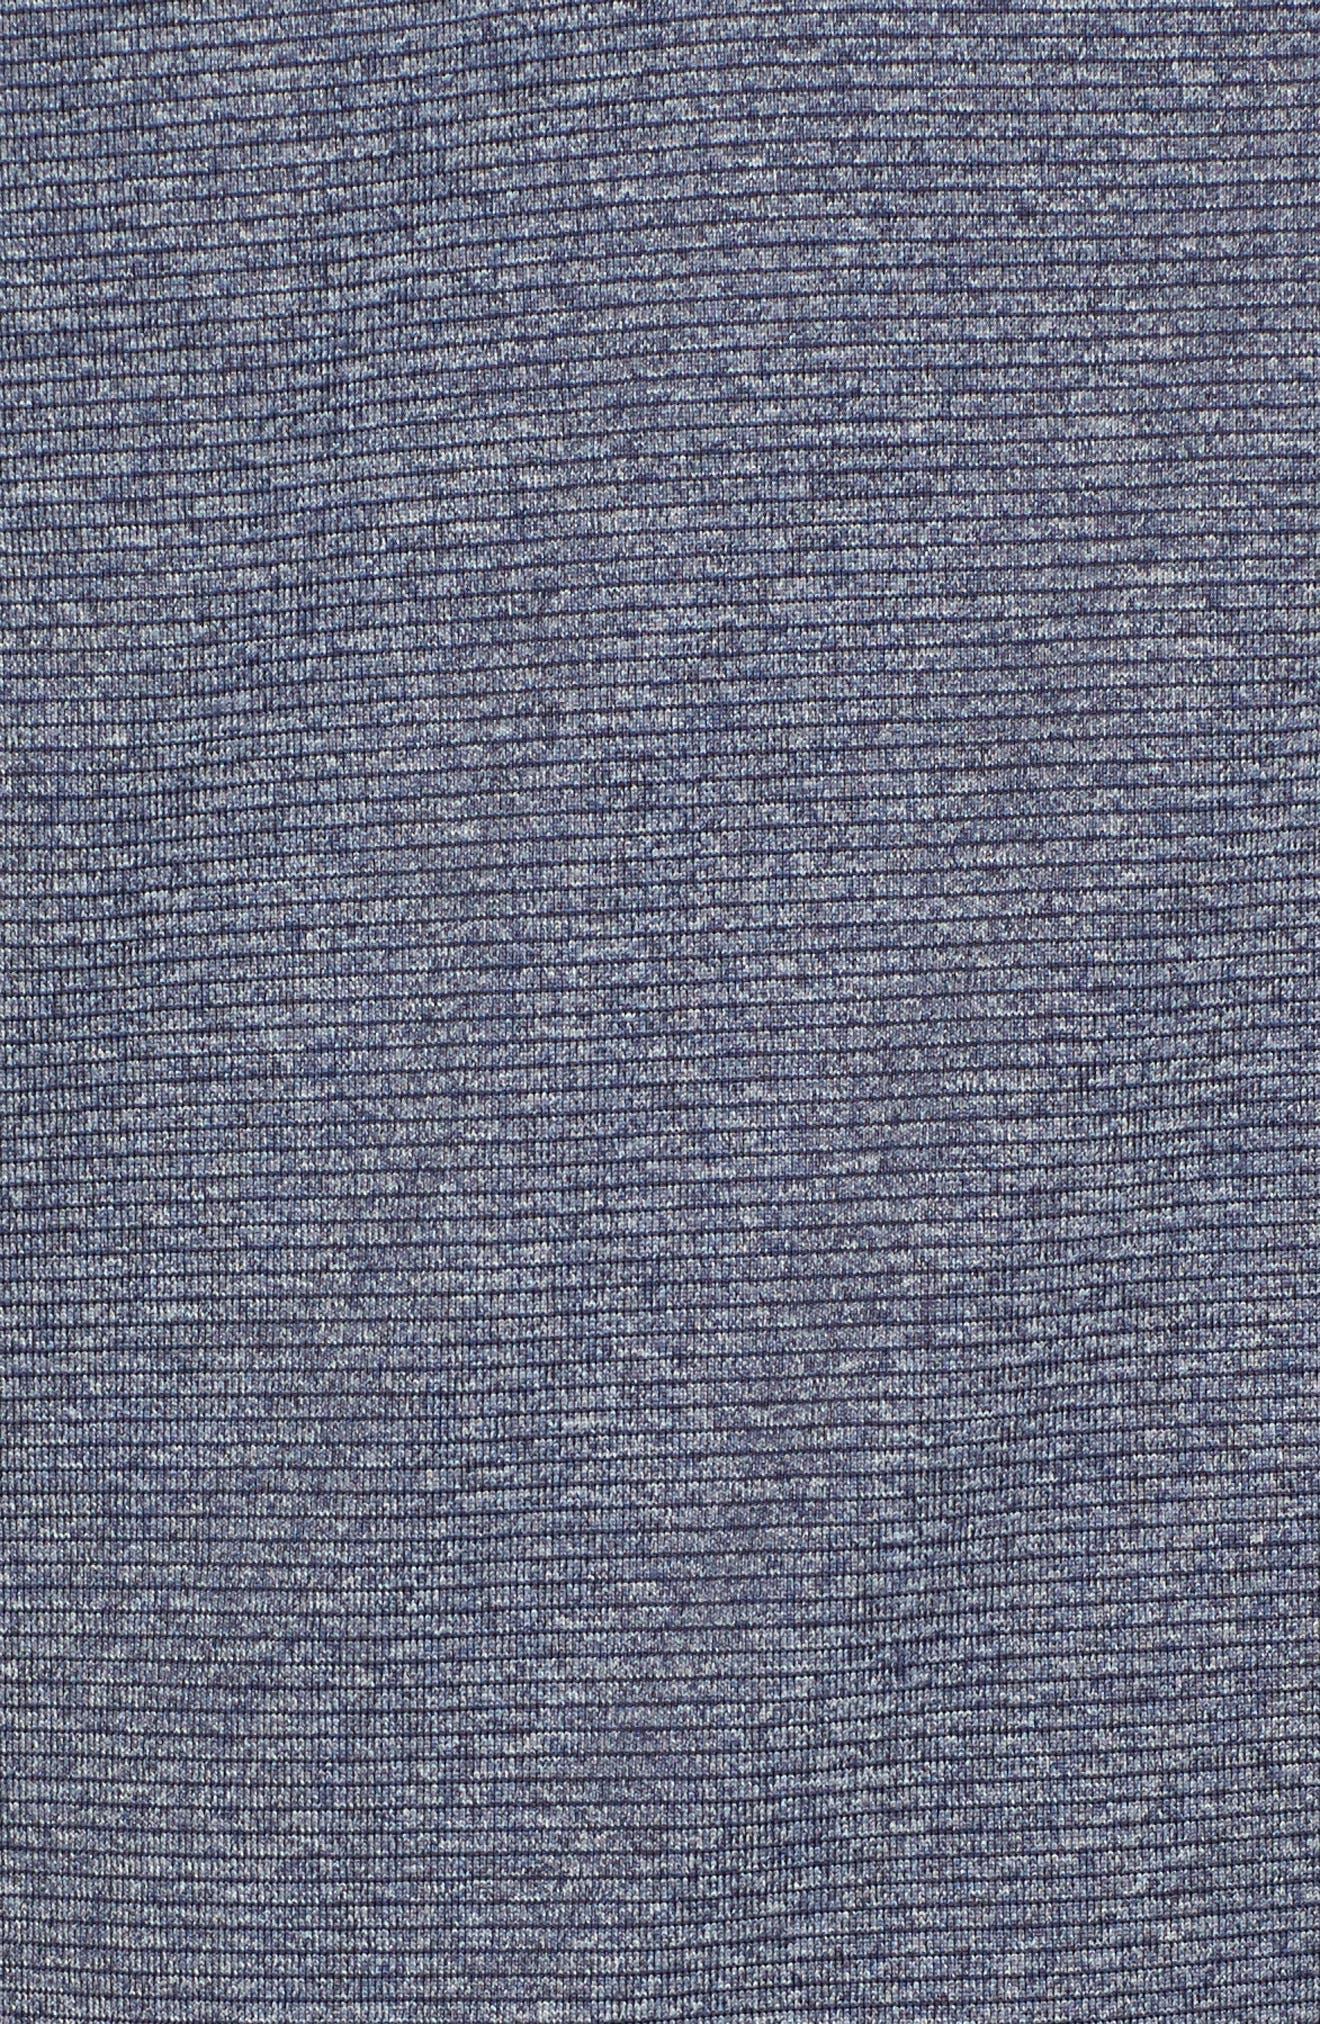 Shoreline - Houston Texans Half Zip Pullover,                             Alternate thumbnail 5, color,                             976